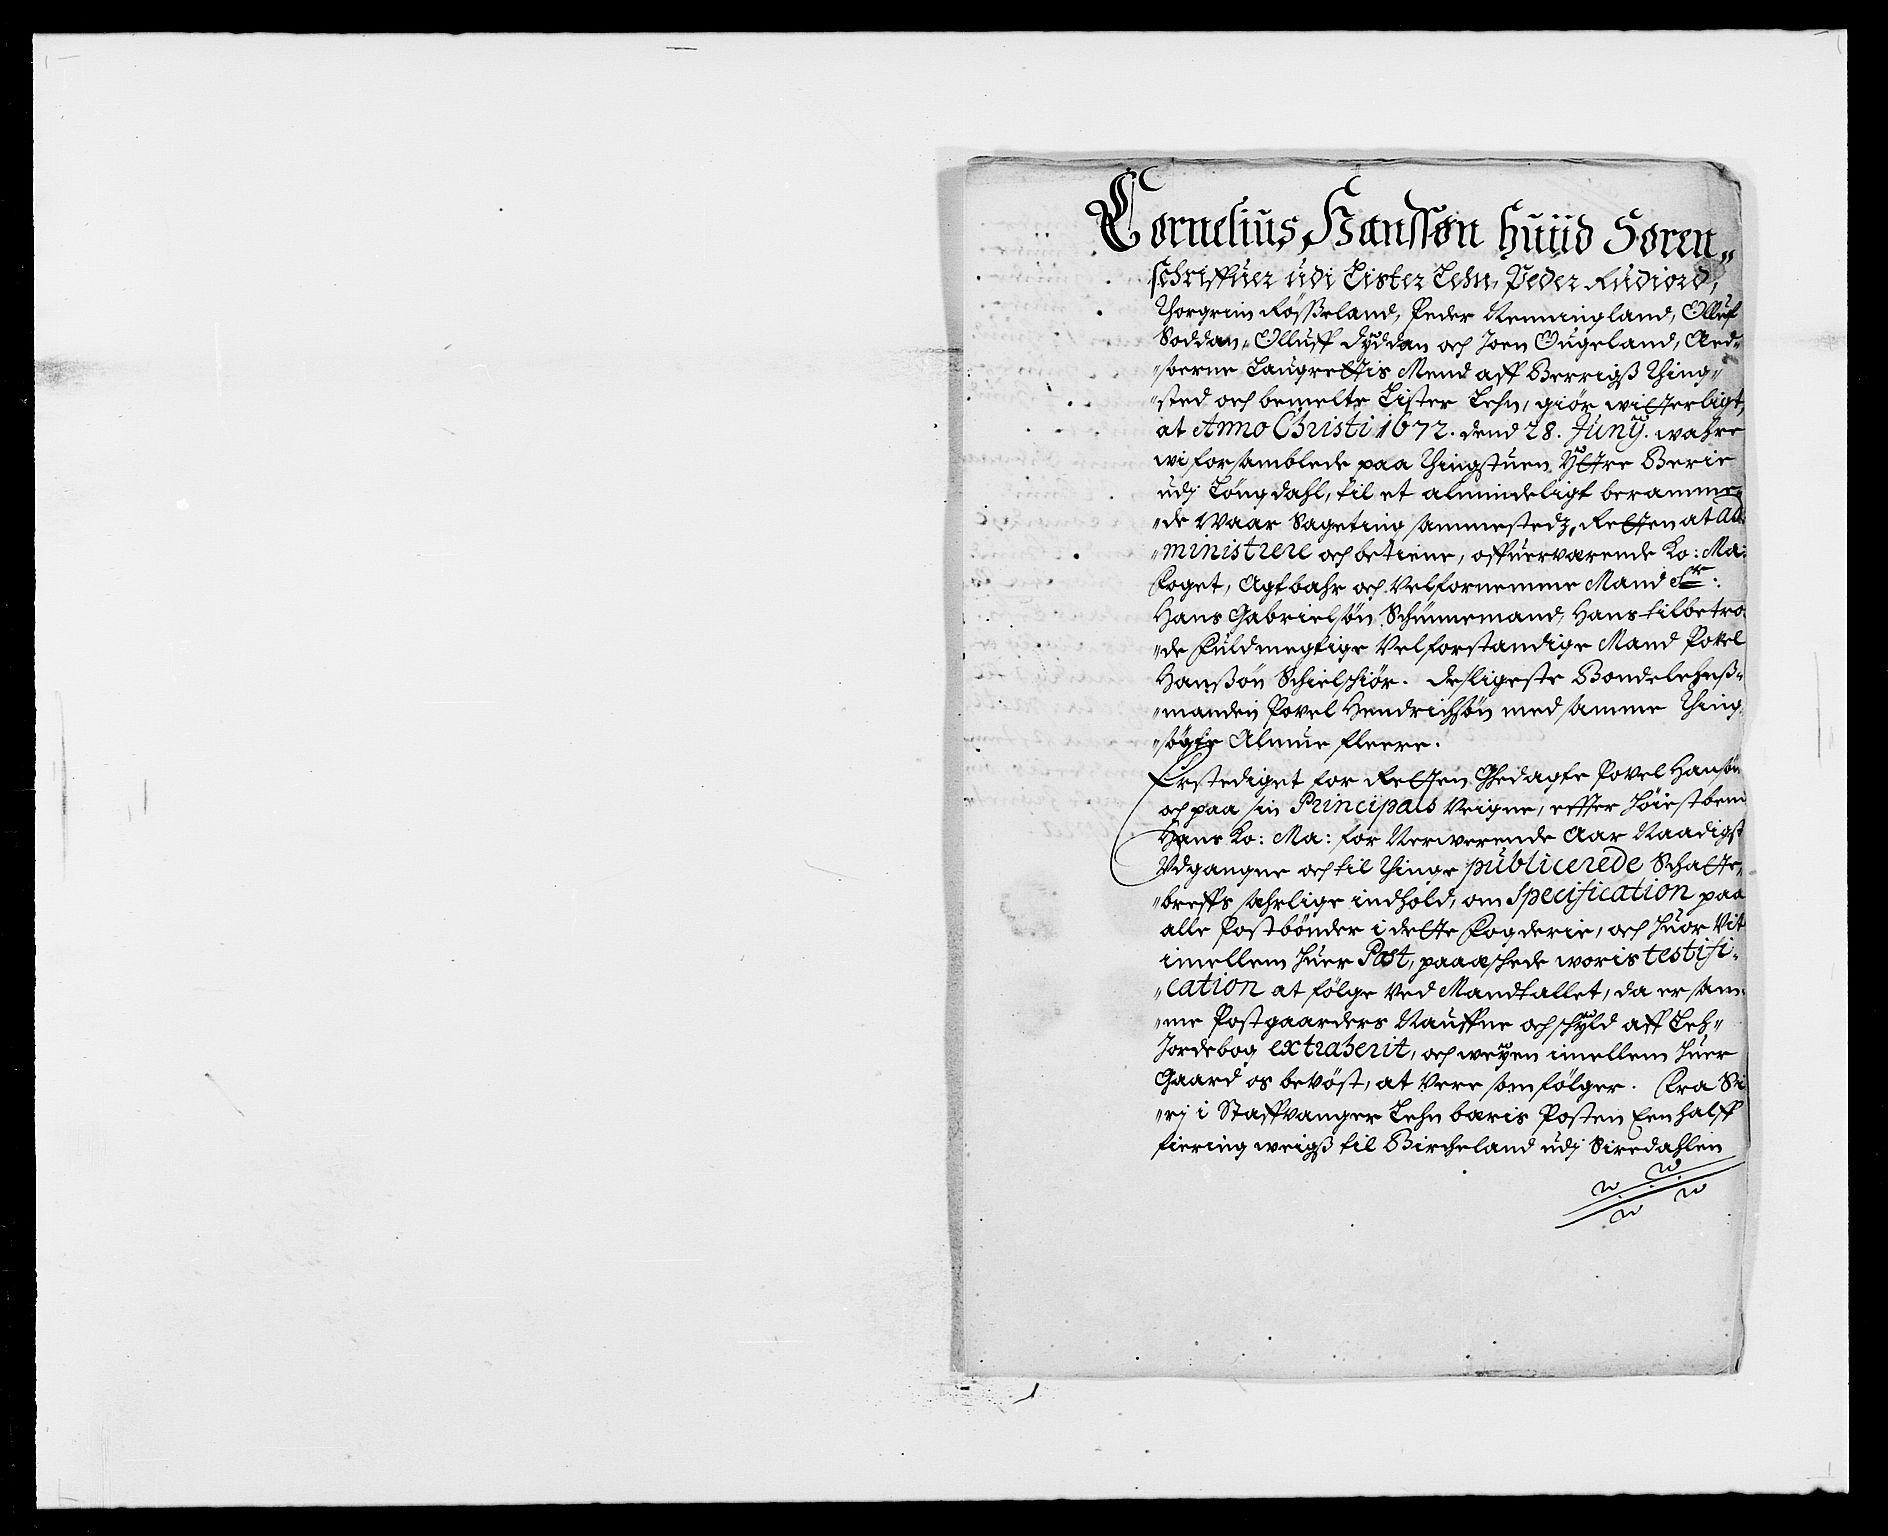 RA, Rentekammeret inntil 1814, Reviderte regnskaper, Fogderegnskap, R41/L2525: Fogderegnskap Lista, 1669-1671, s. 244